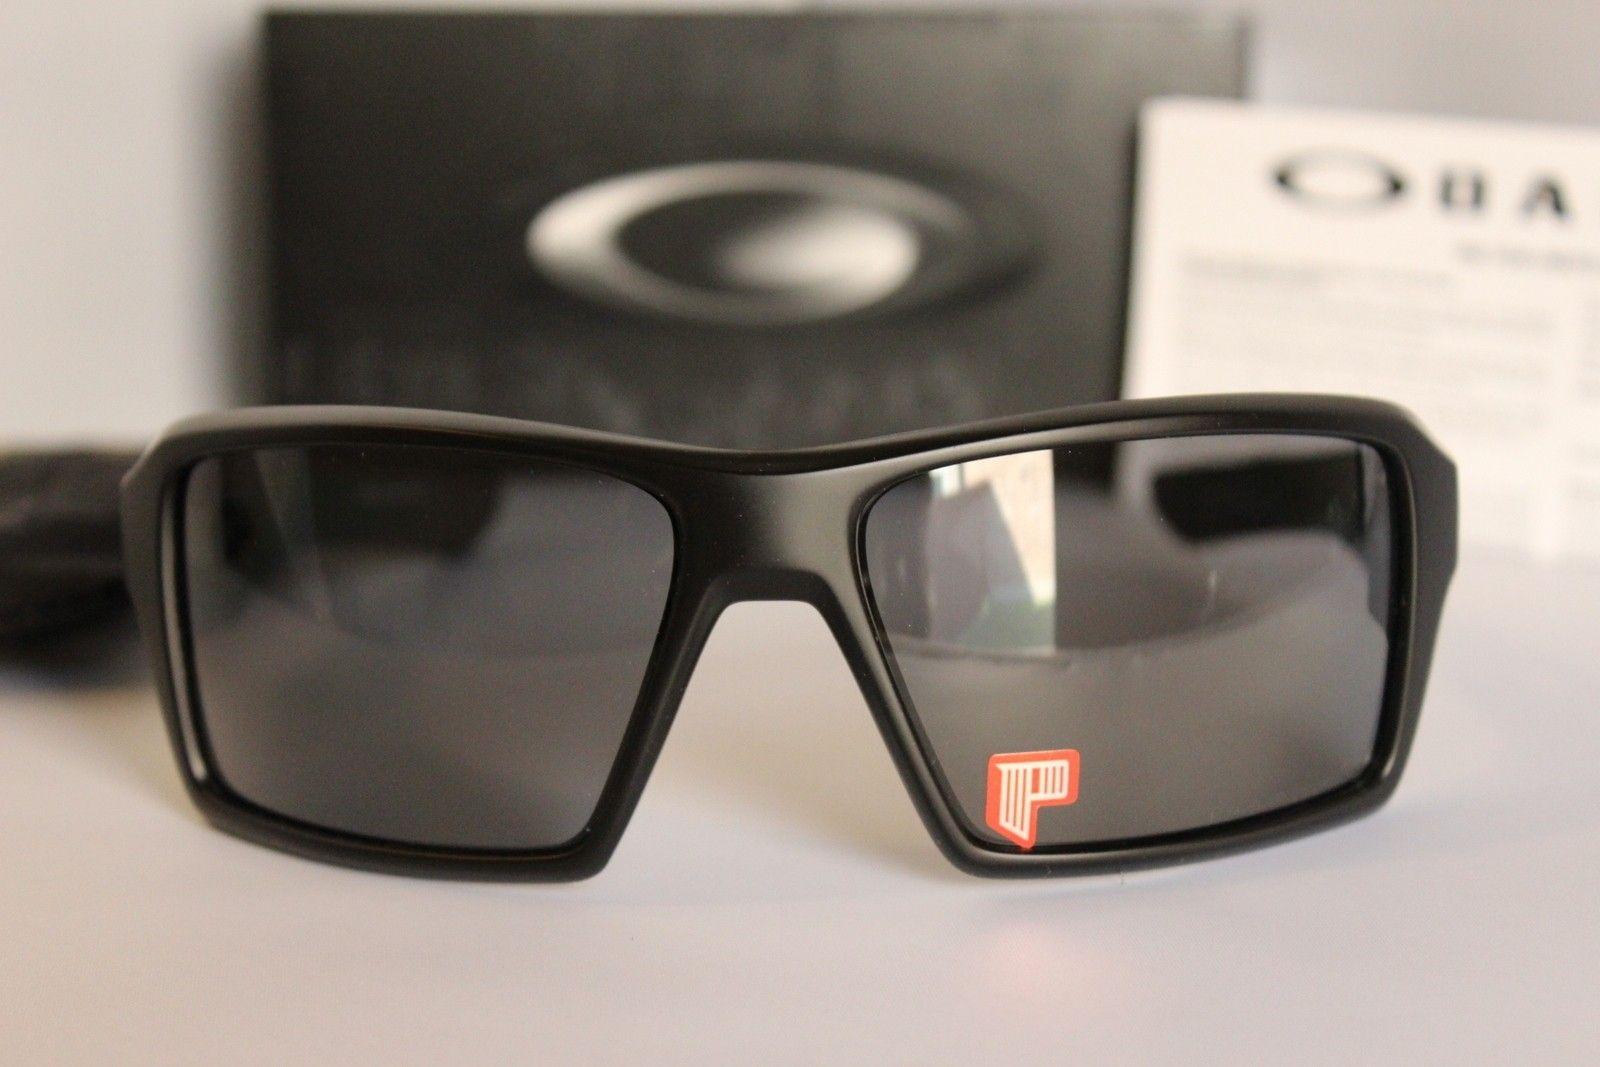 Shaun White Eyepatch 2 OO9136-12 - IMG_6197.JPG